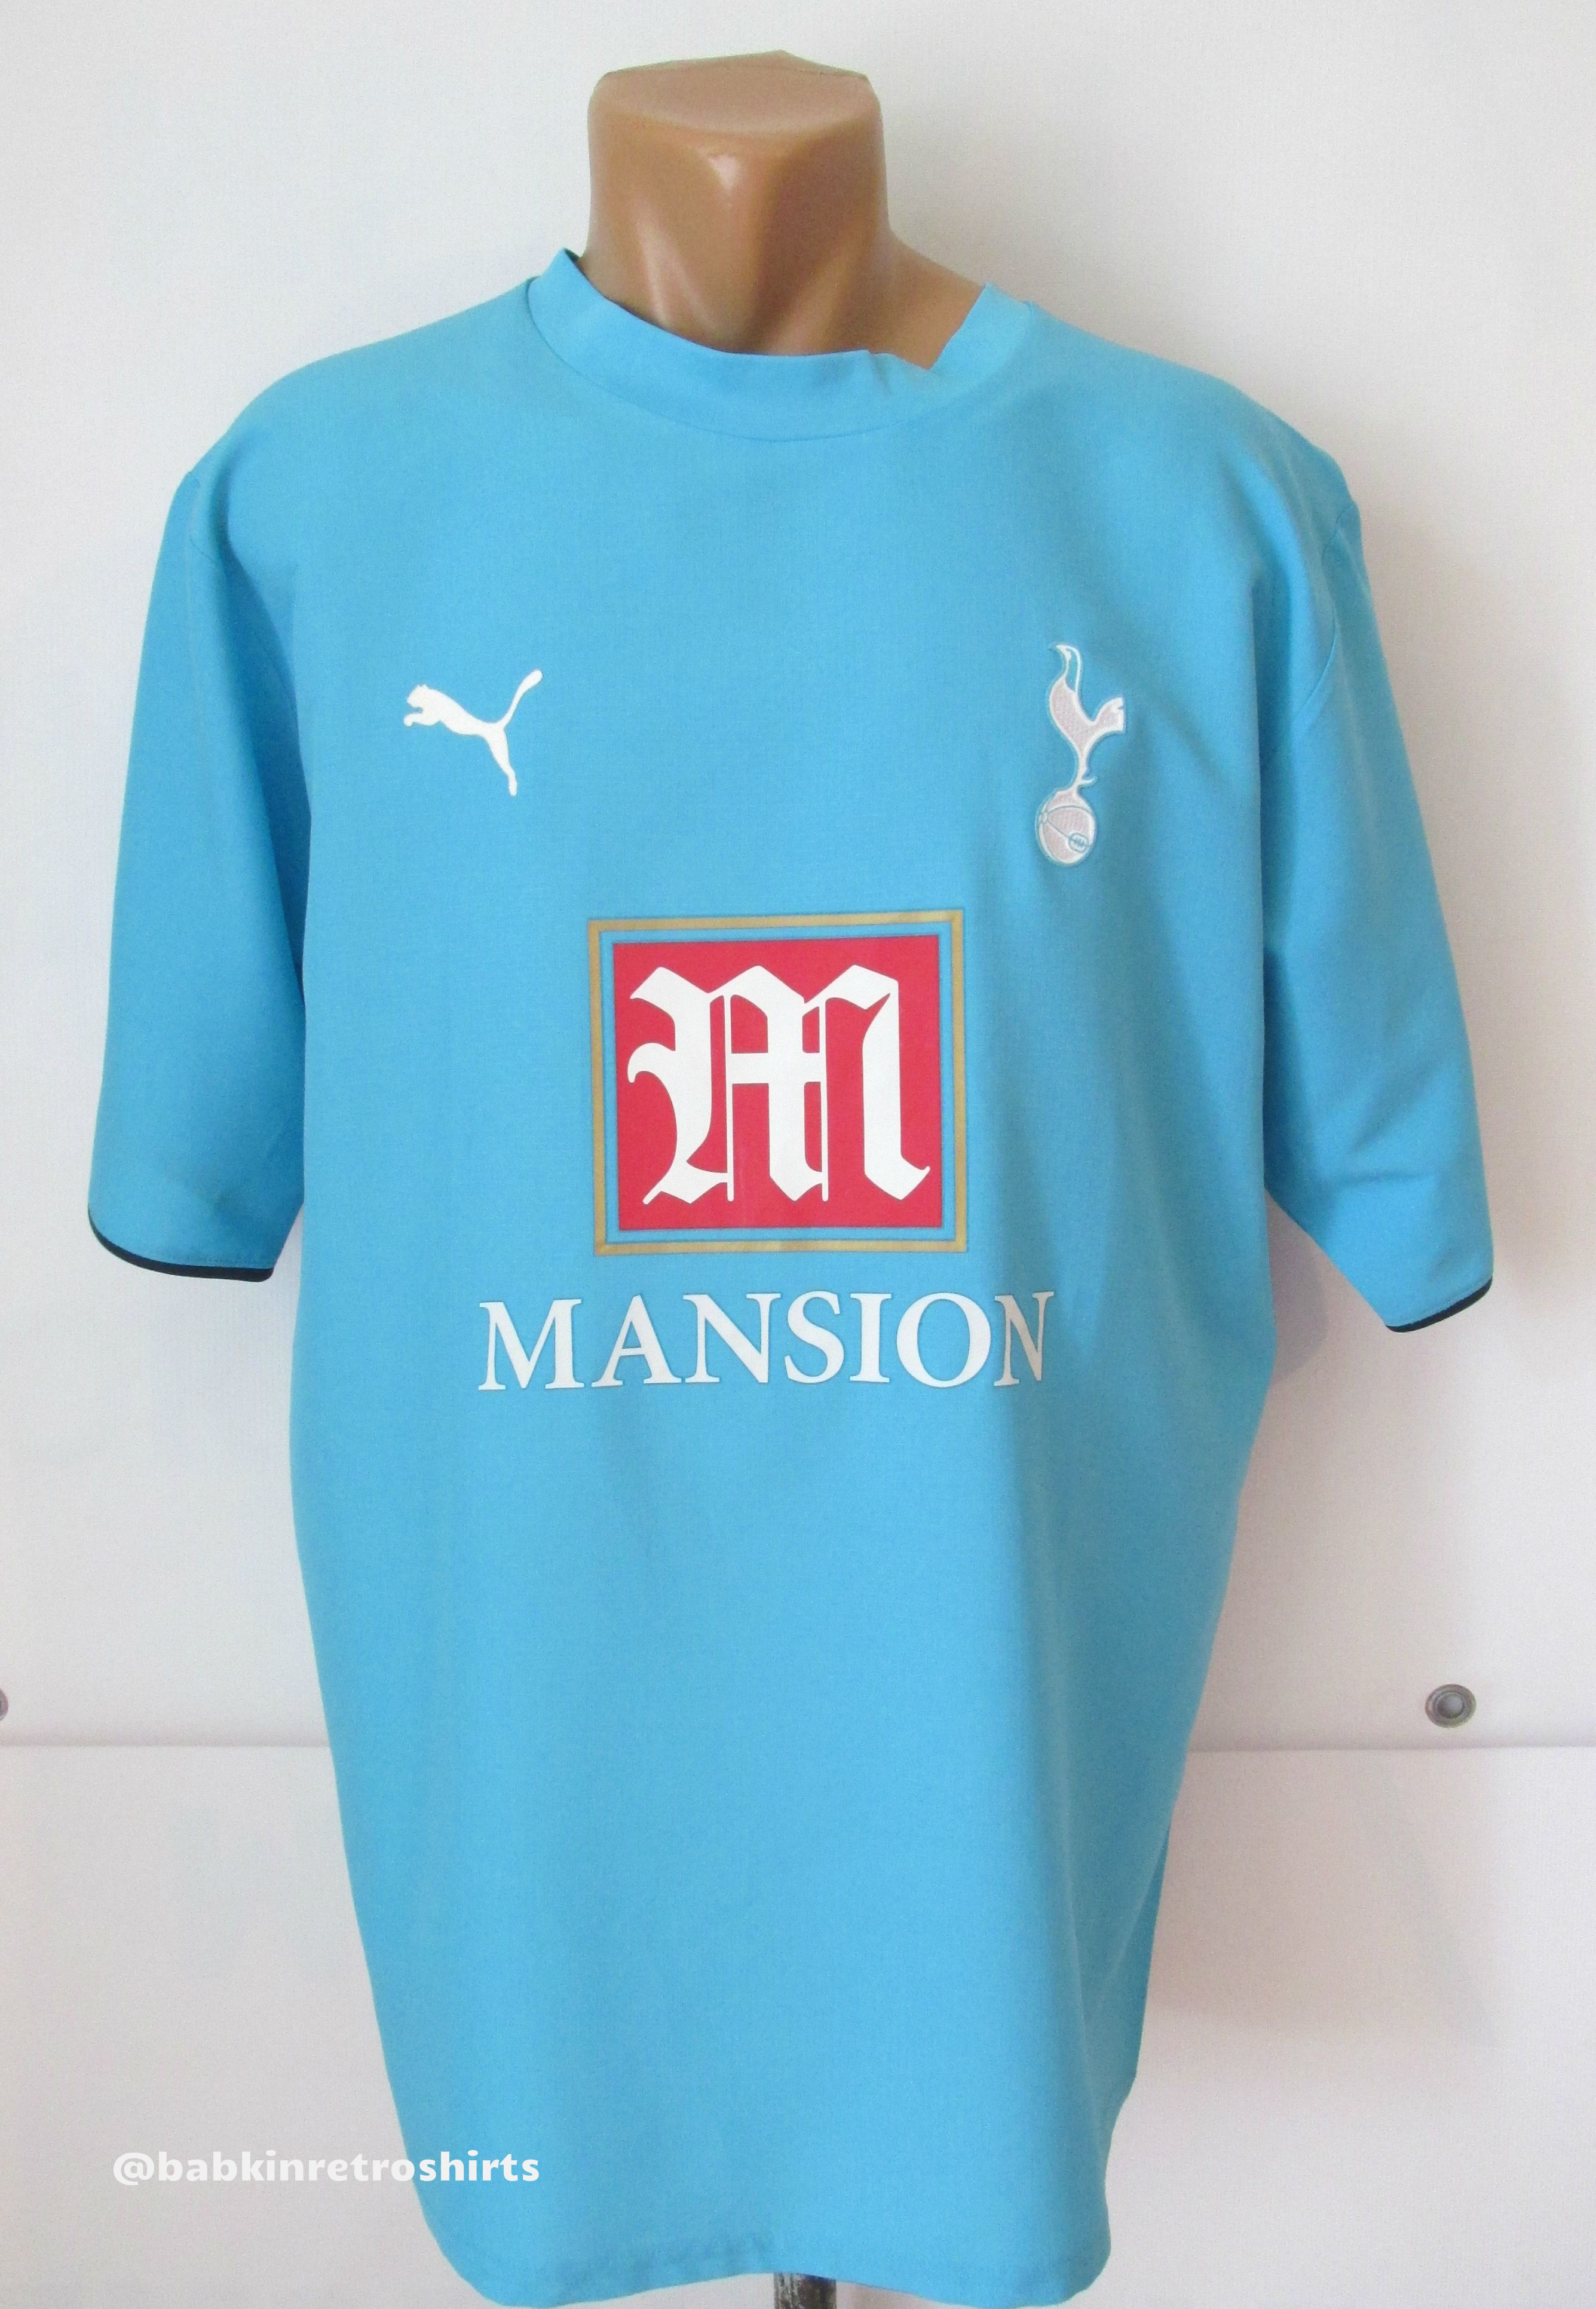 new products b38b0 9ef88 Tottenham Hotspur 2006/2007 away football shirt by Puma ...